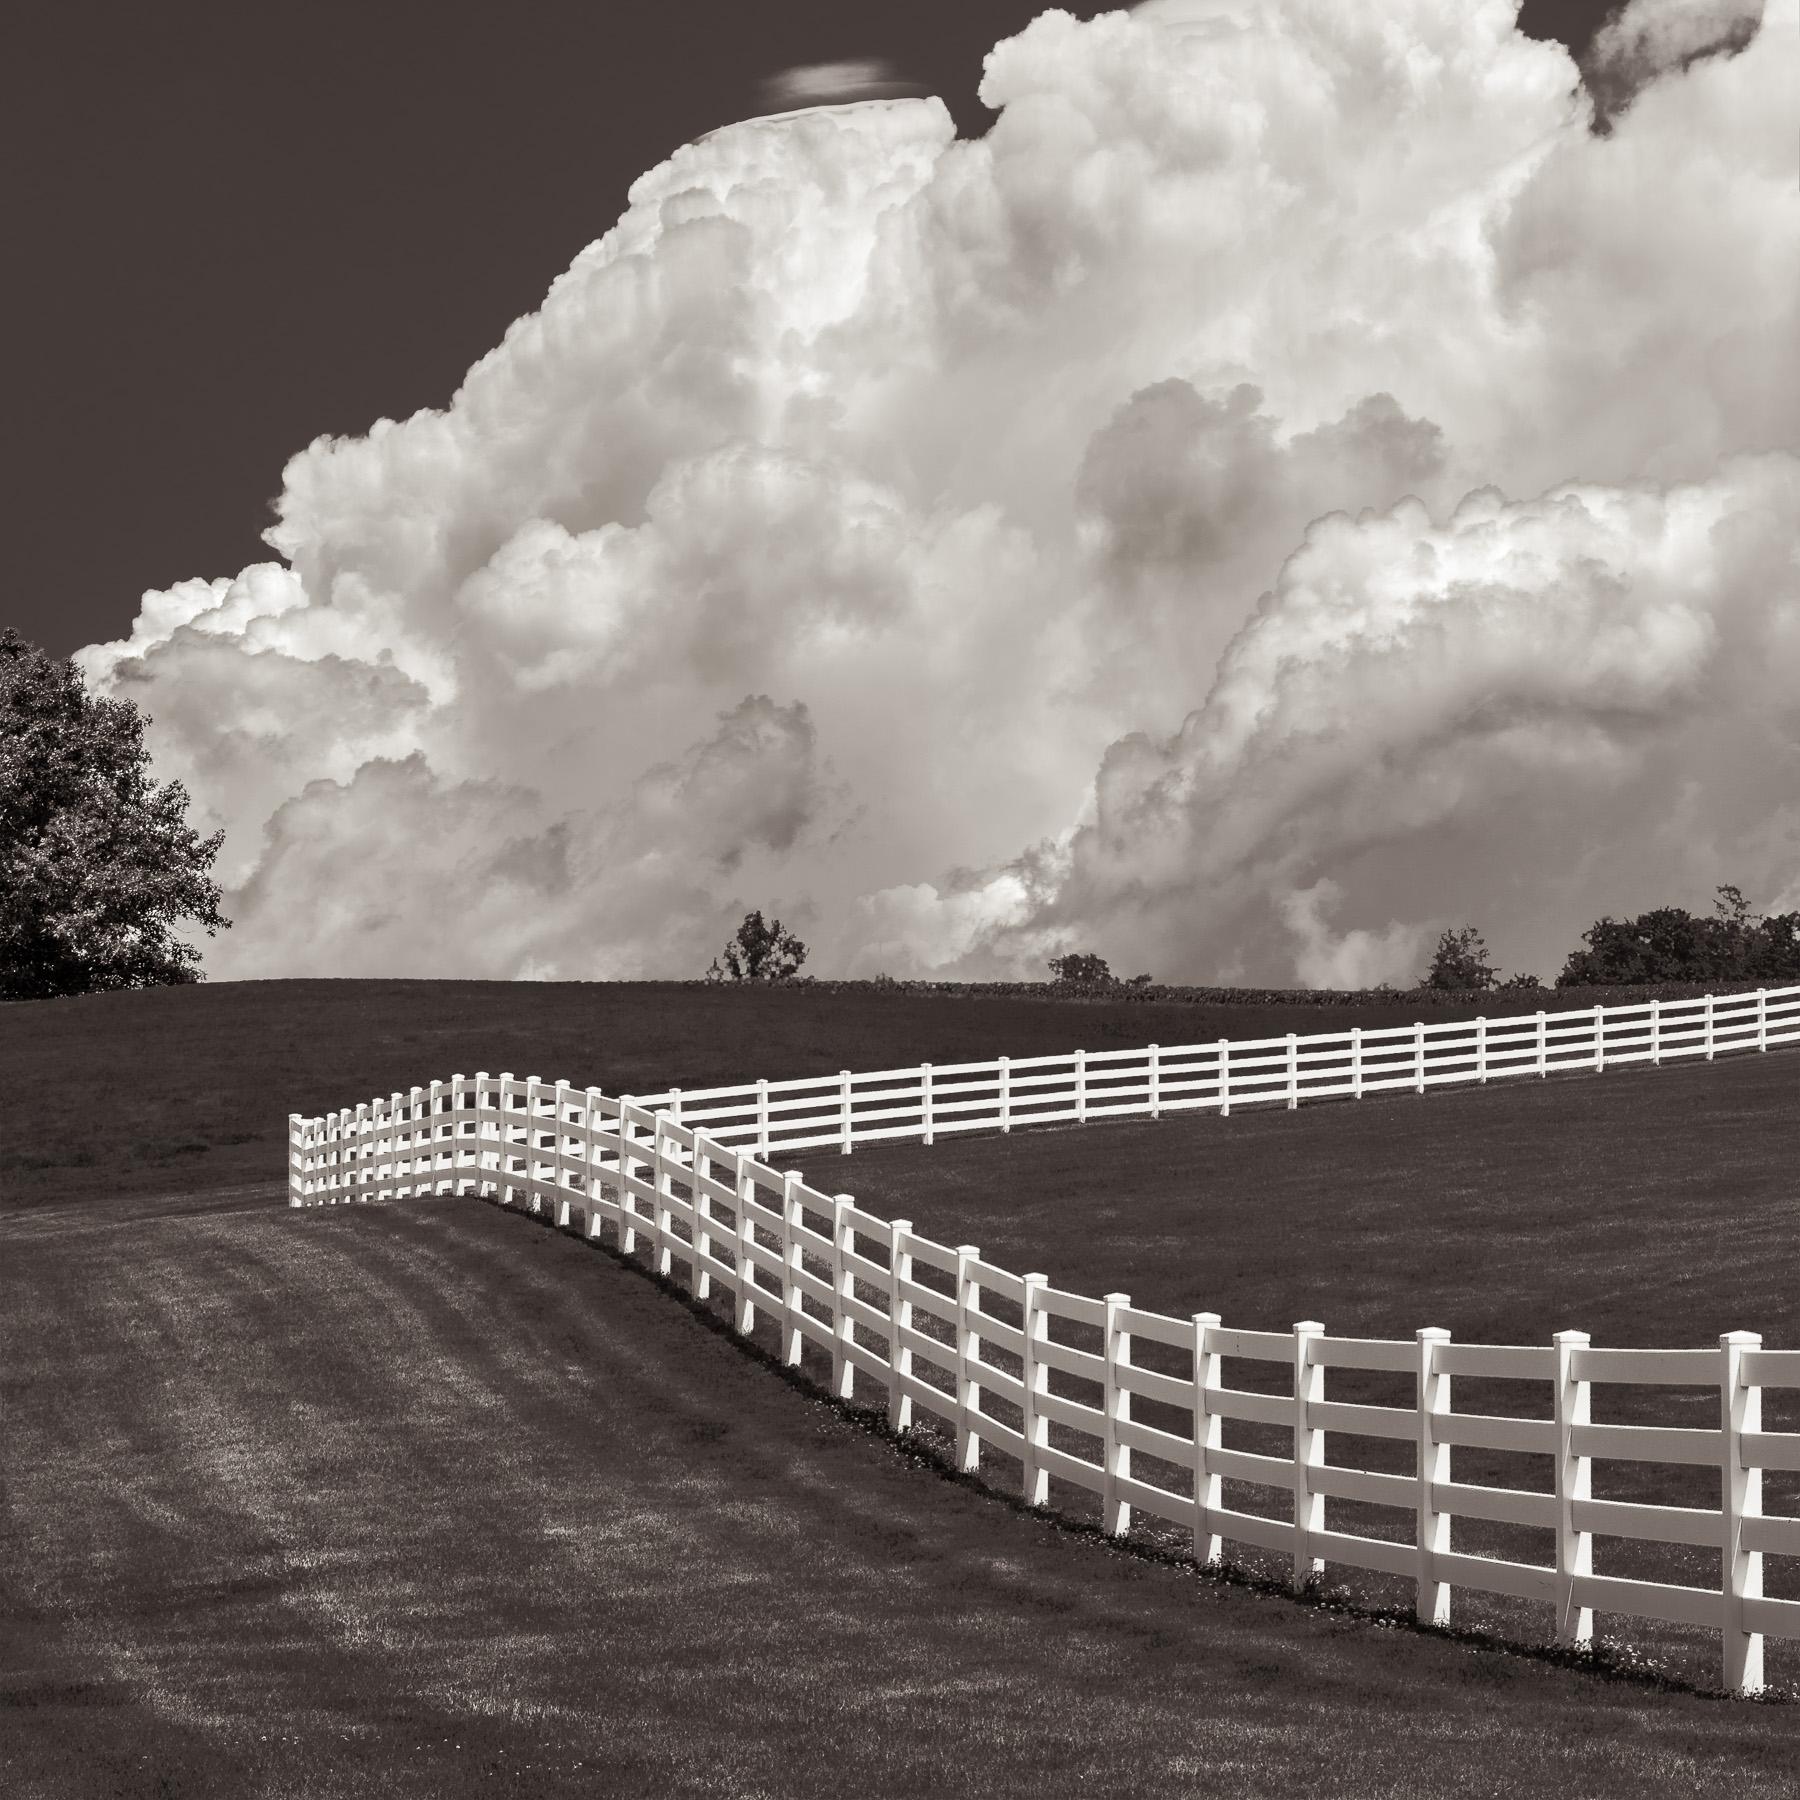 - © Michael Knapstein, 'Fenceline, Midwest Memoir'